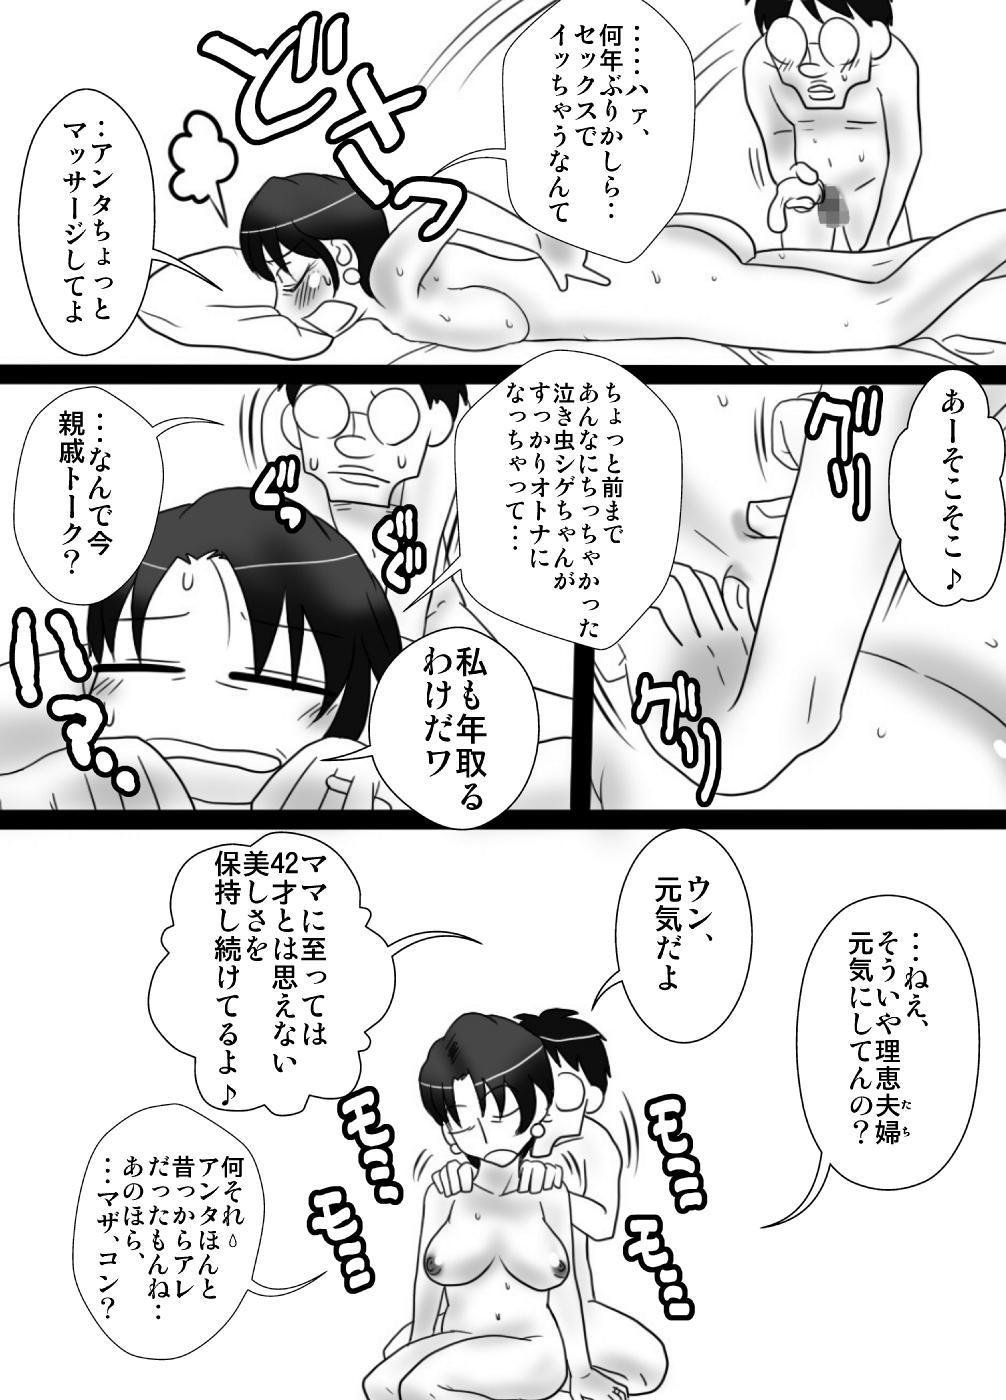 Oba-san o Otosuze! 33